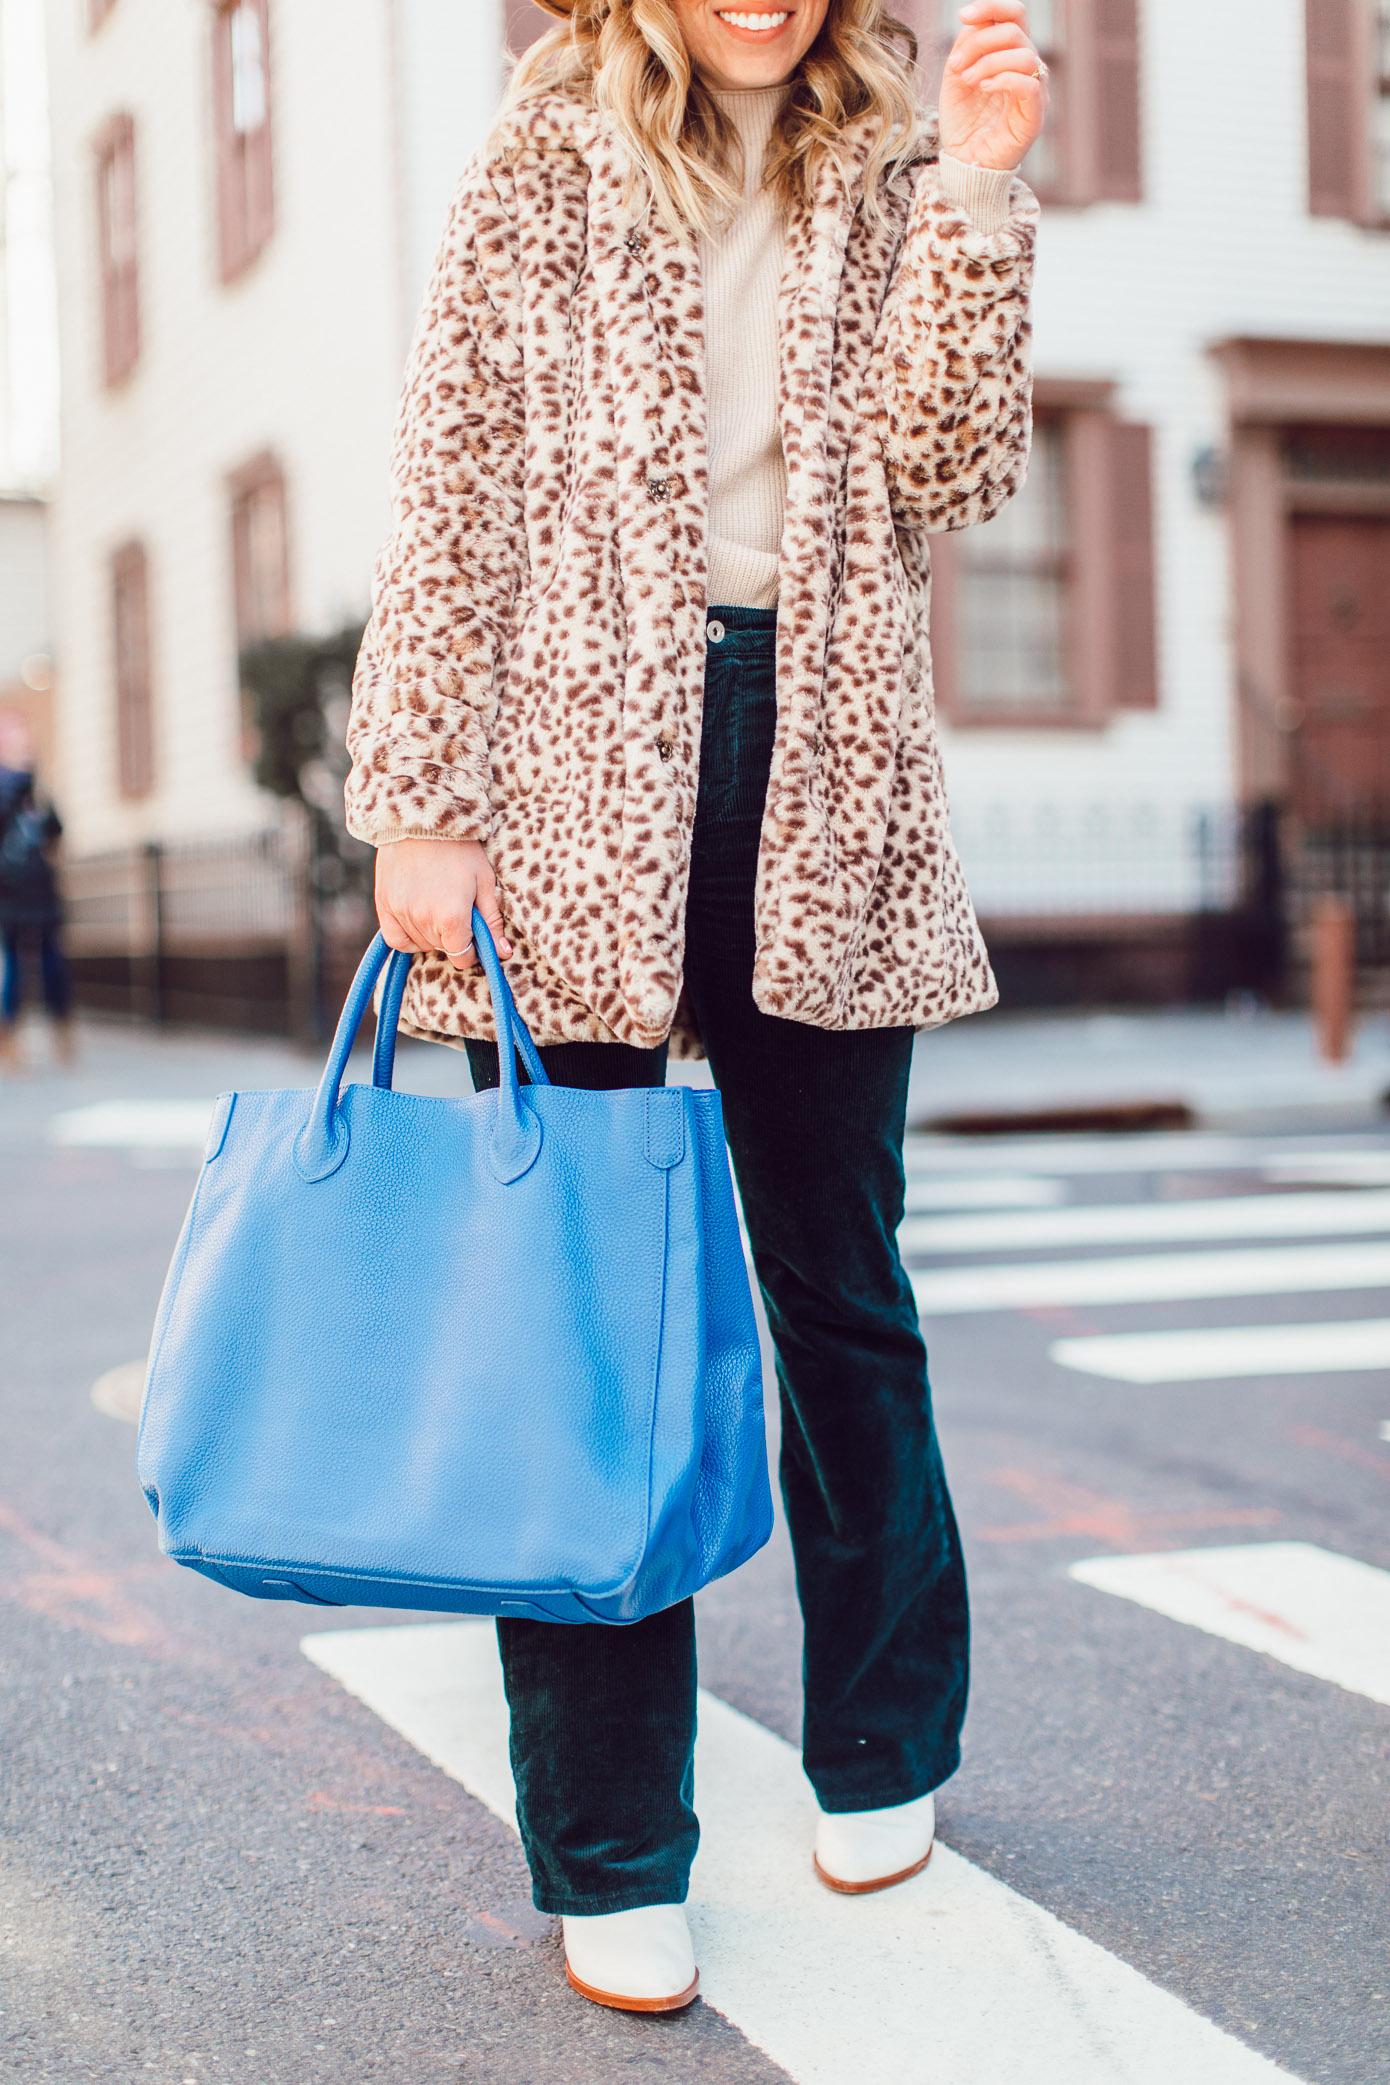 Winter Wardrobe Basics | Retro Outfit Idea - Faux Fur Leopard Coat, Corduroy Pants, Bright Blue Leather Tote, Bronze Felt Hat, White Booties featured on Louella Reese